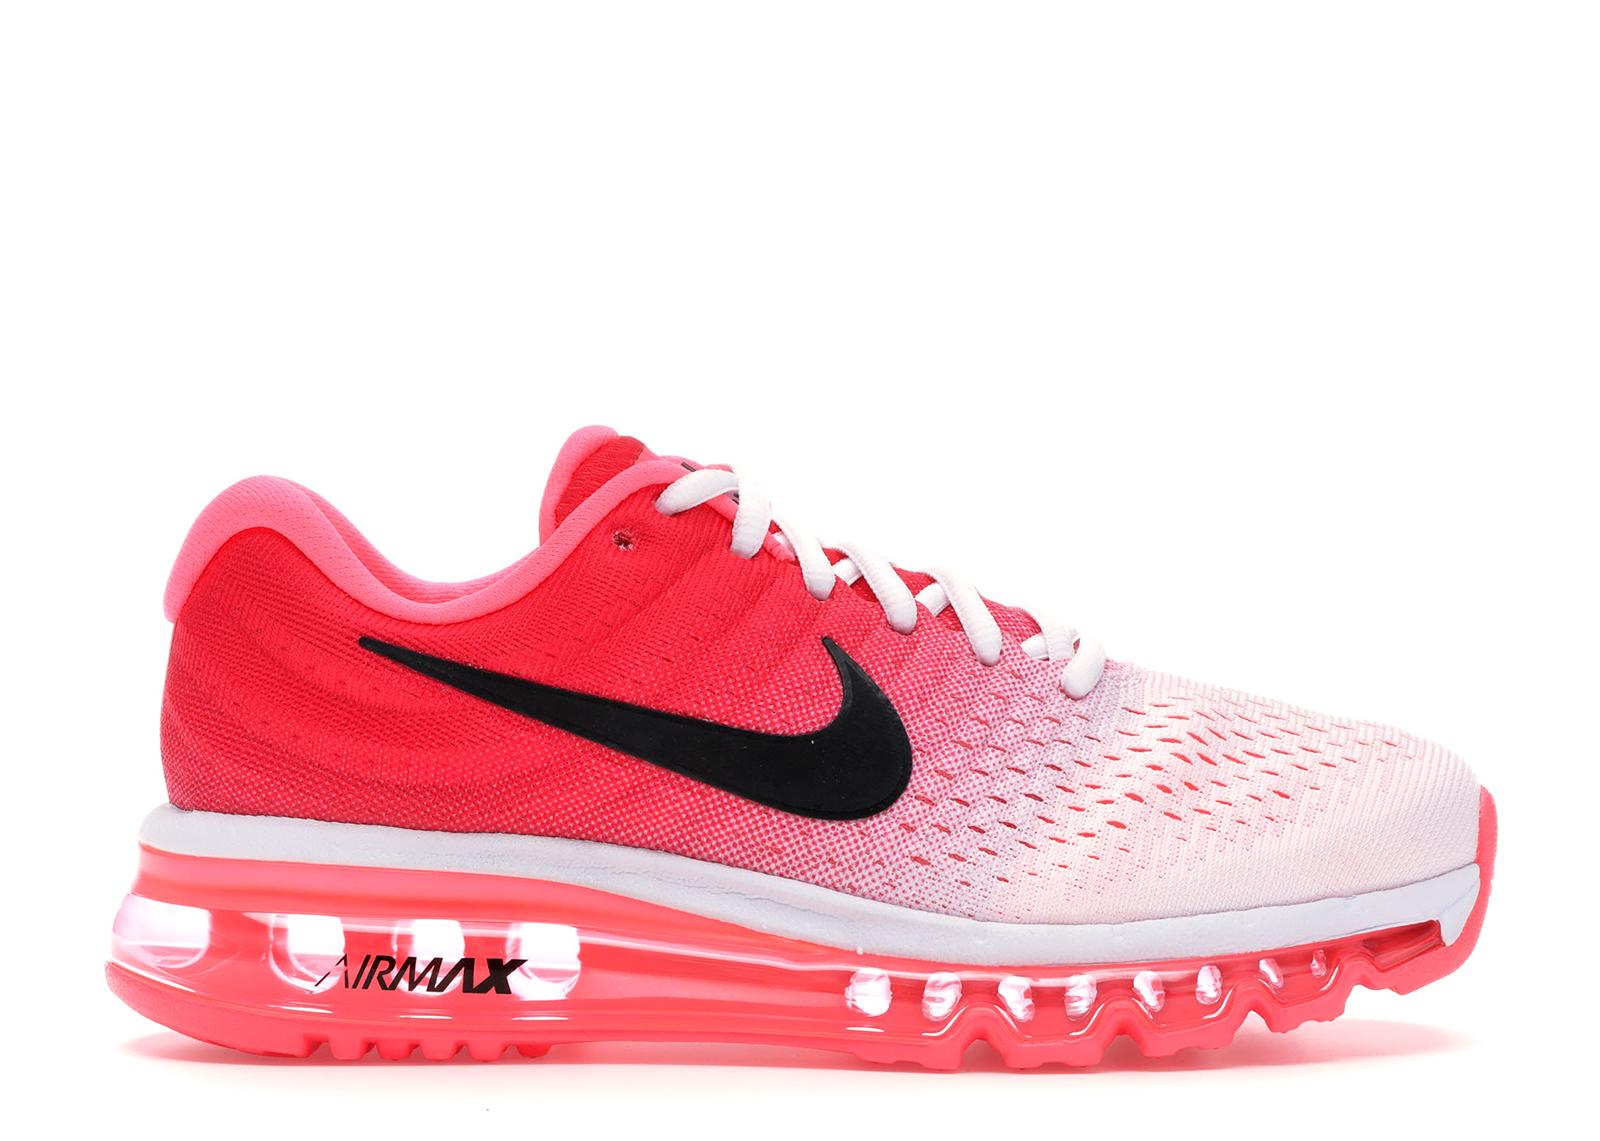 Nike Air Max 2017 Hot Punch (W)